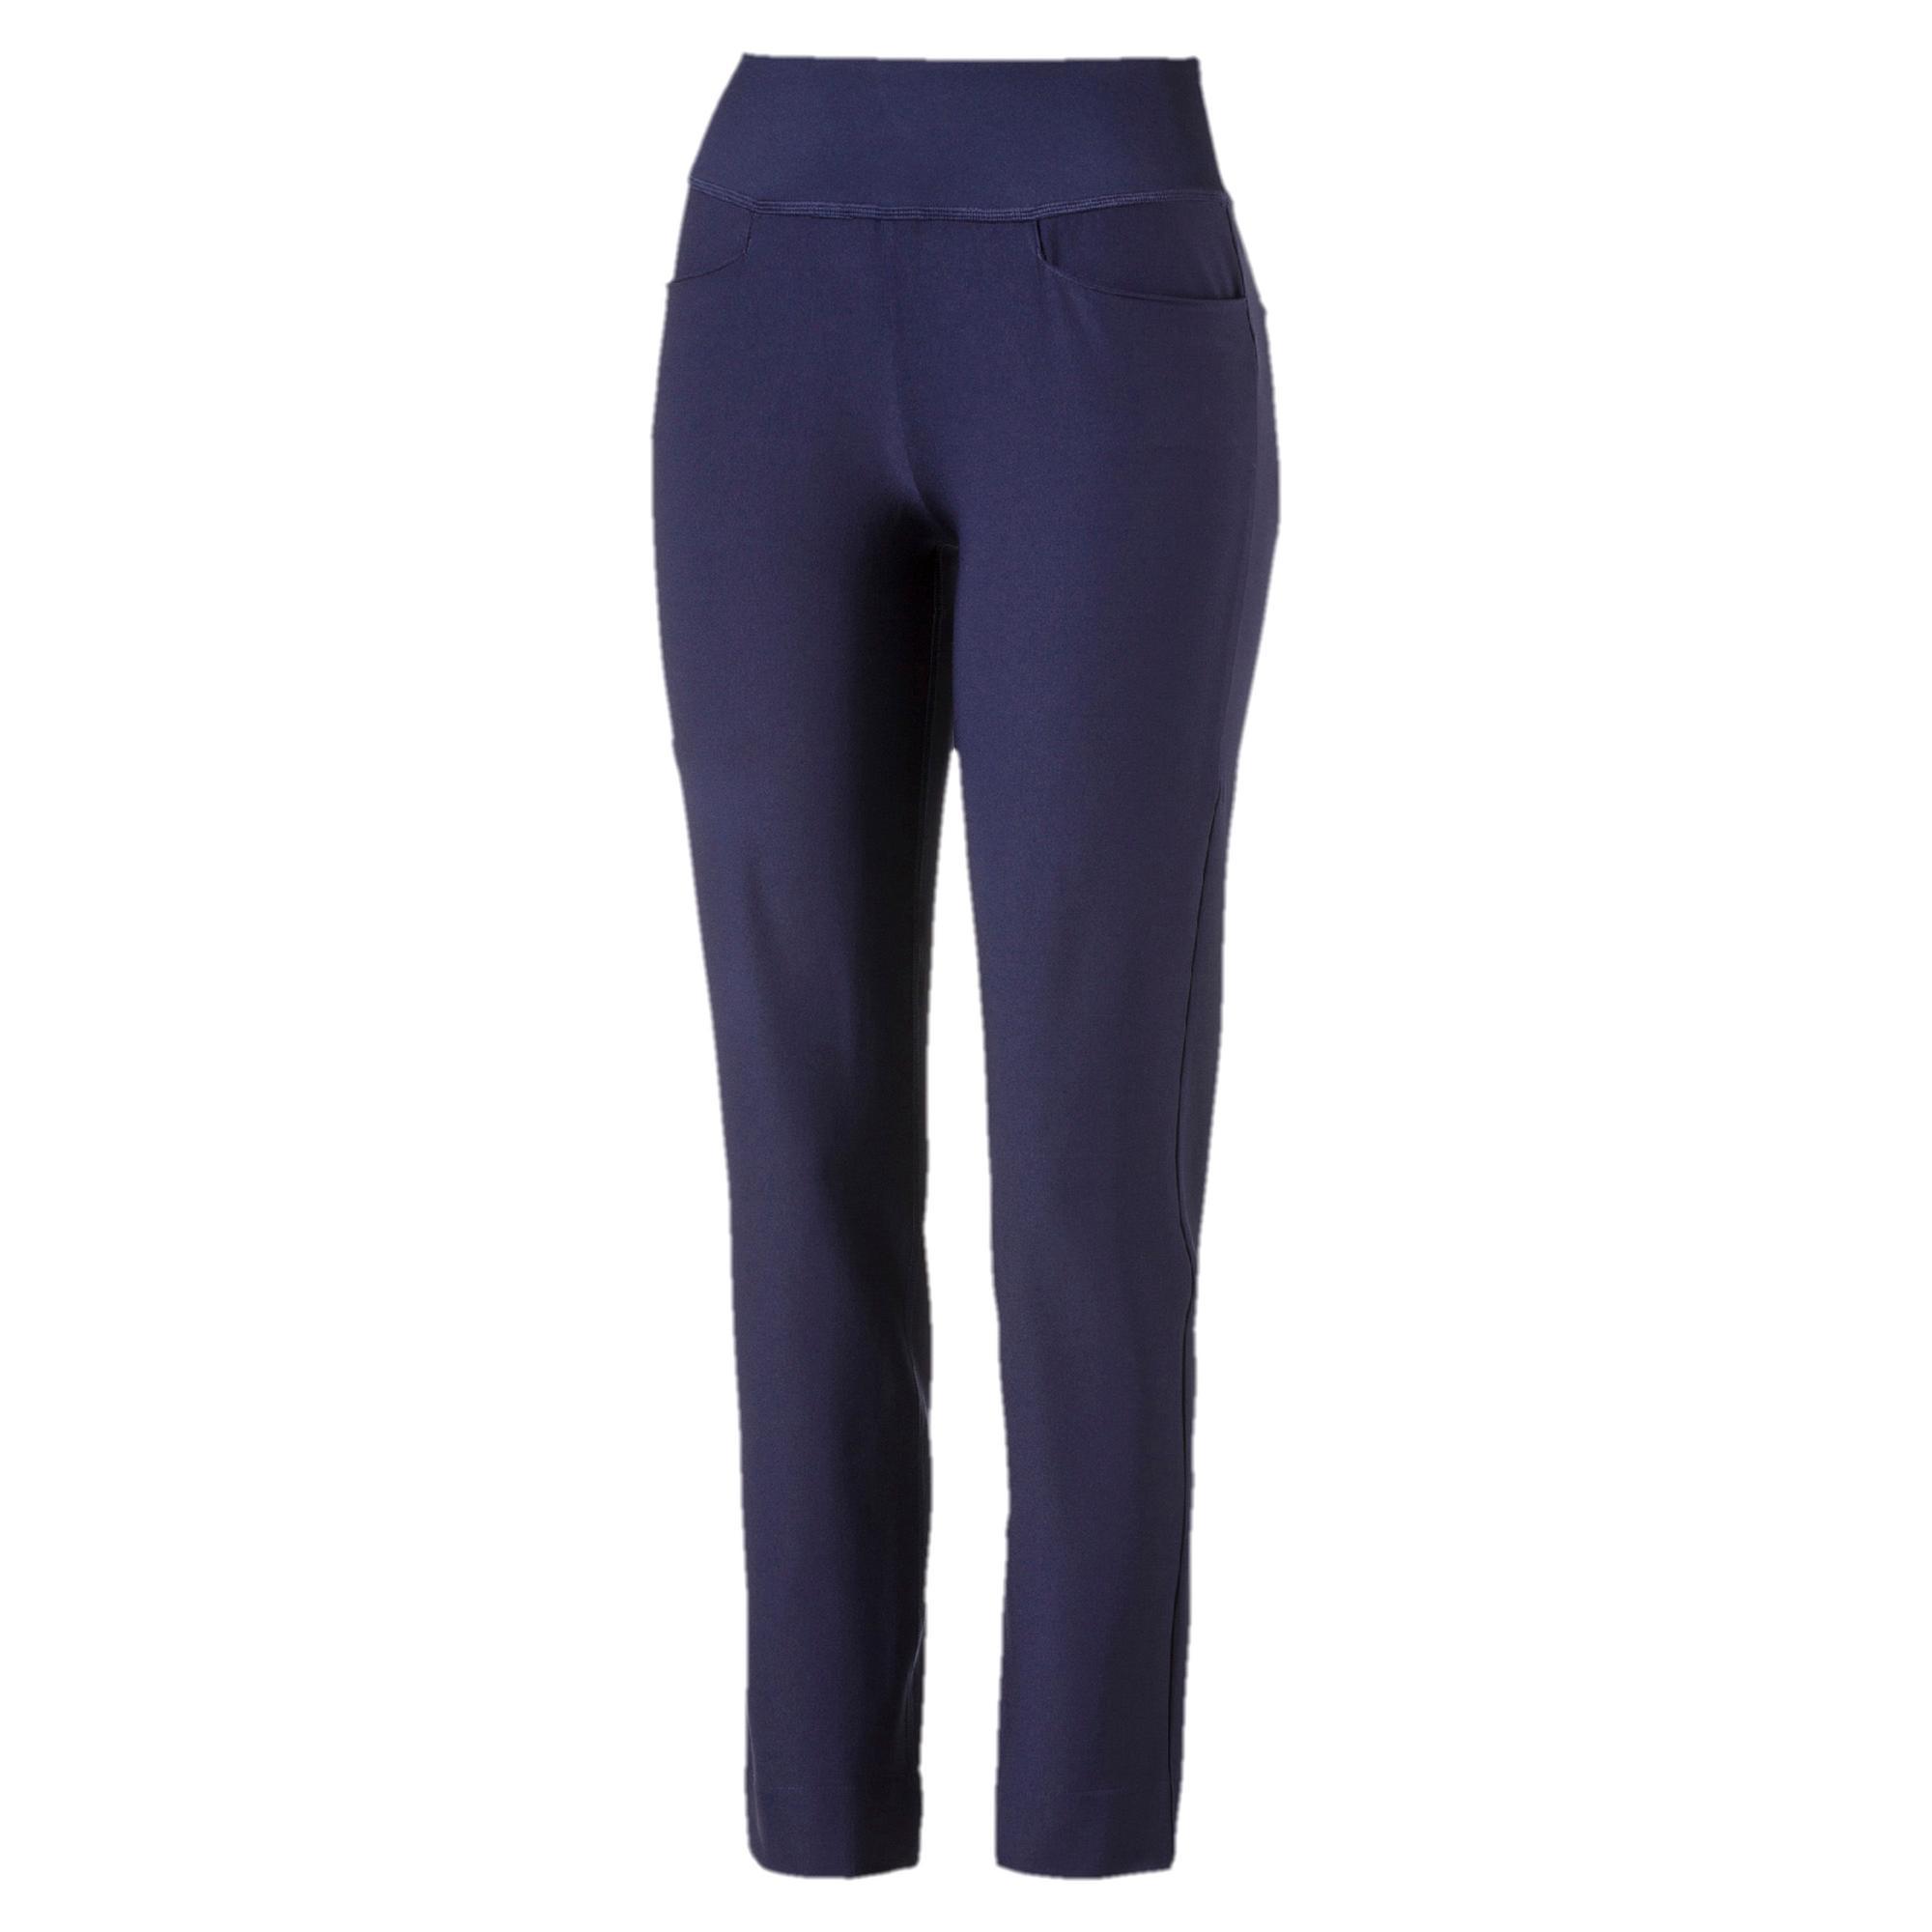 Women's Powershape Pull On Pant